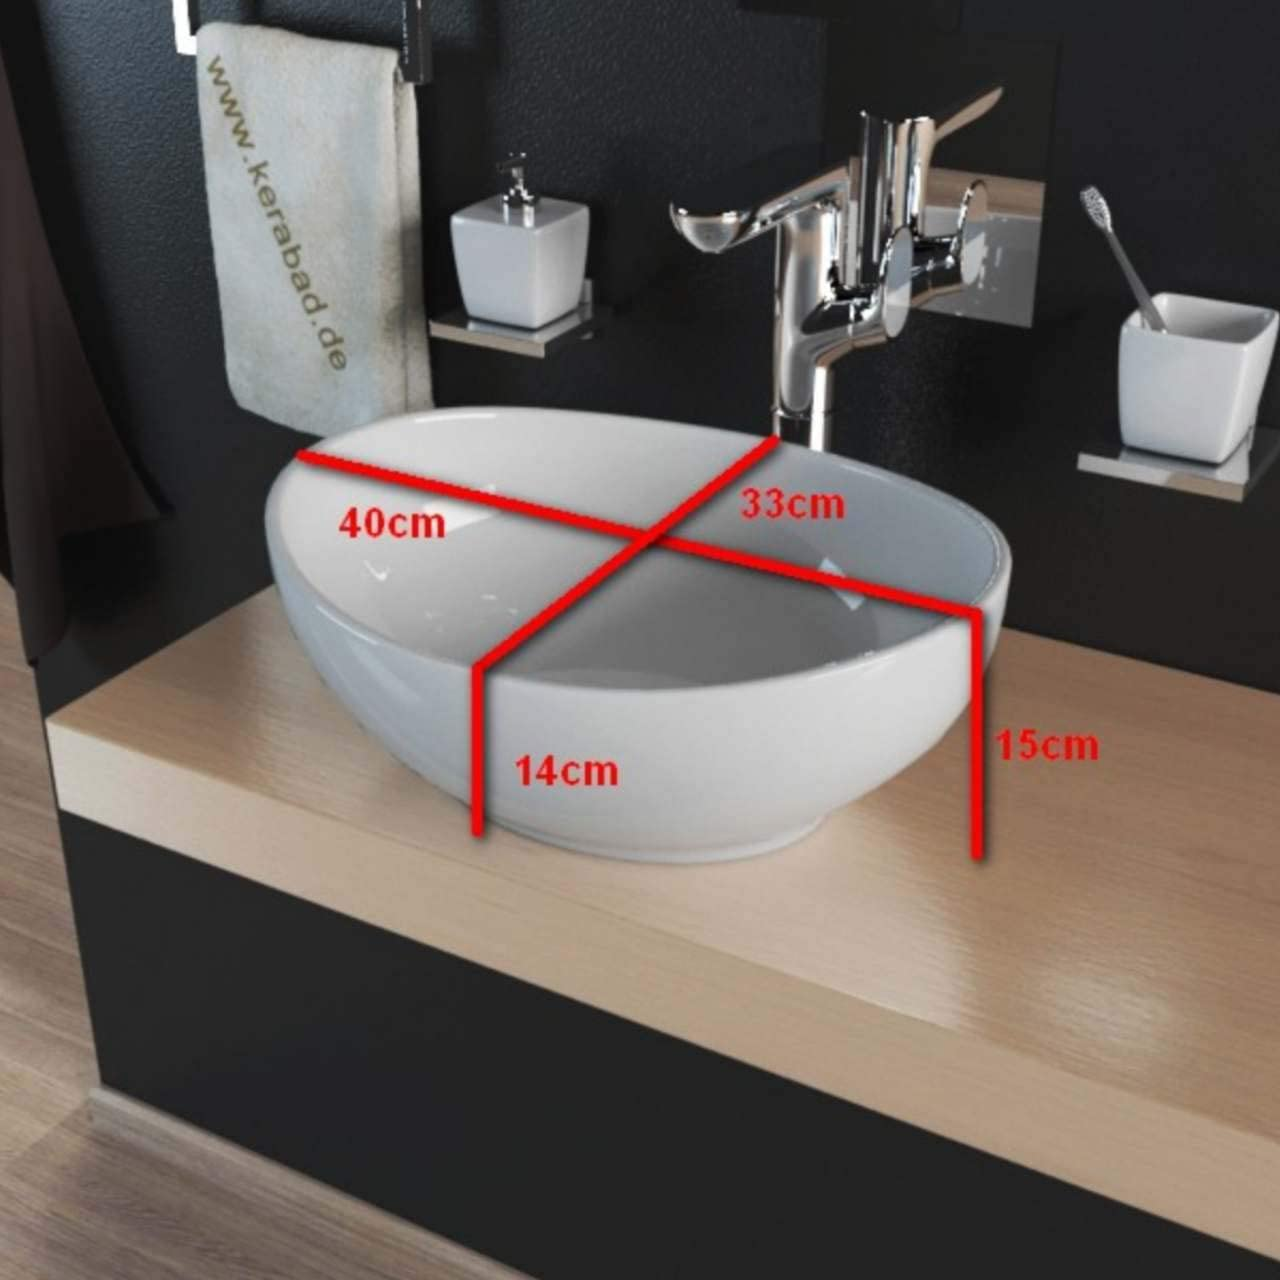 Schule Badezimmer Versteckte Kamera